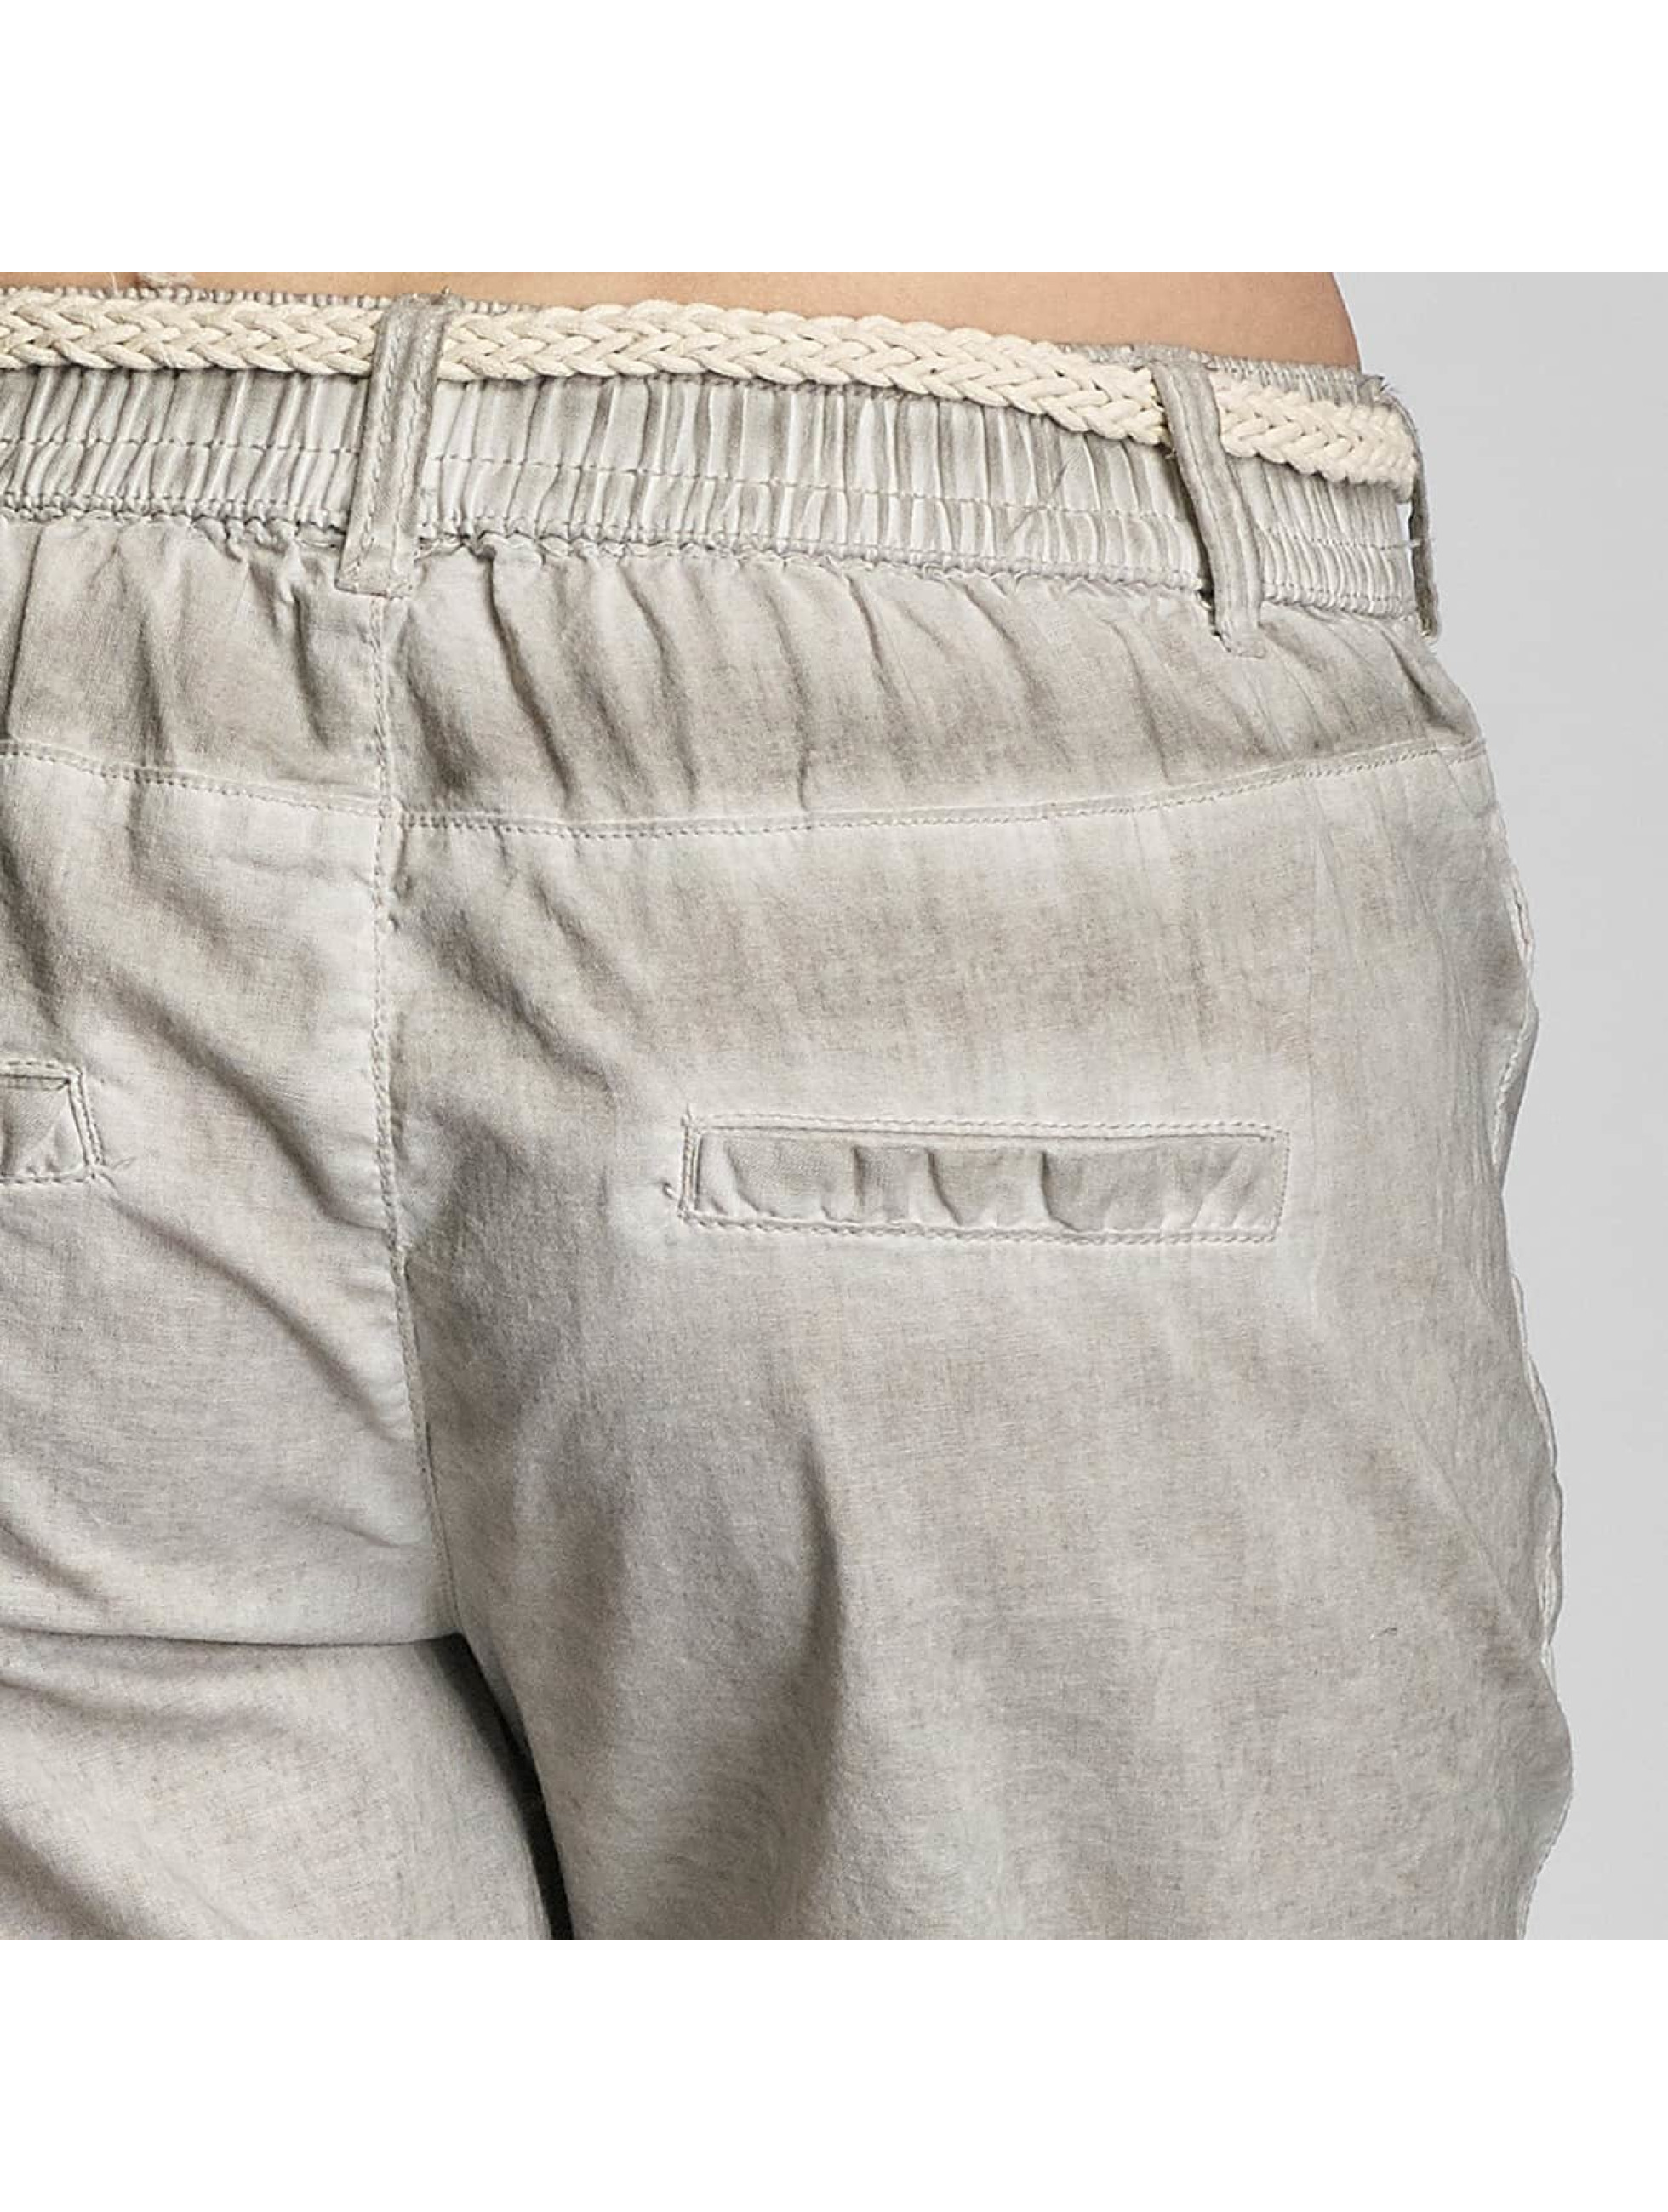 Sublevel Pantalón cortos Pepita gris